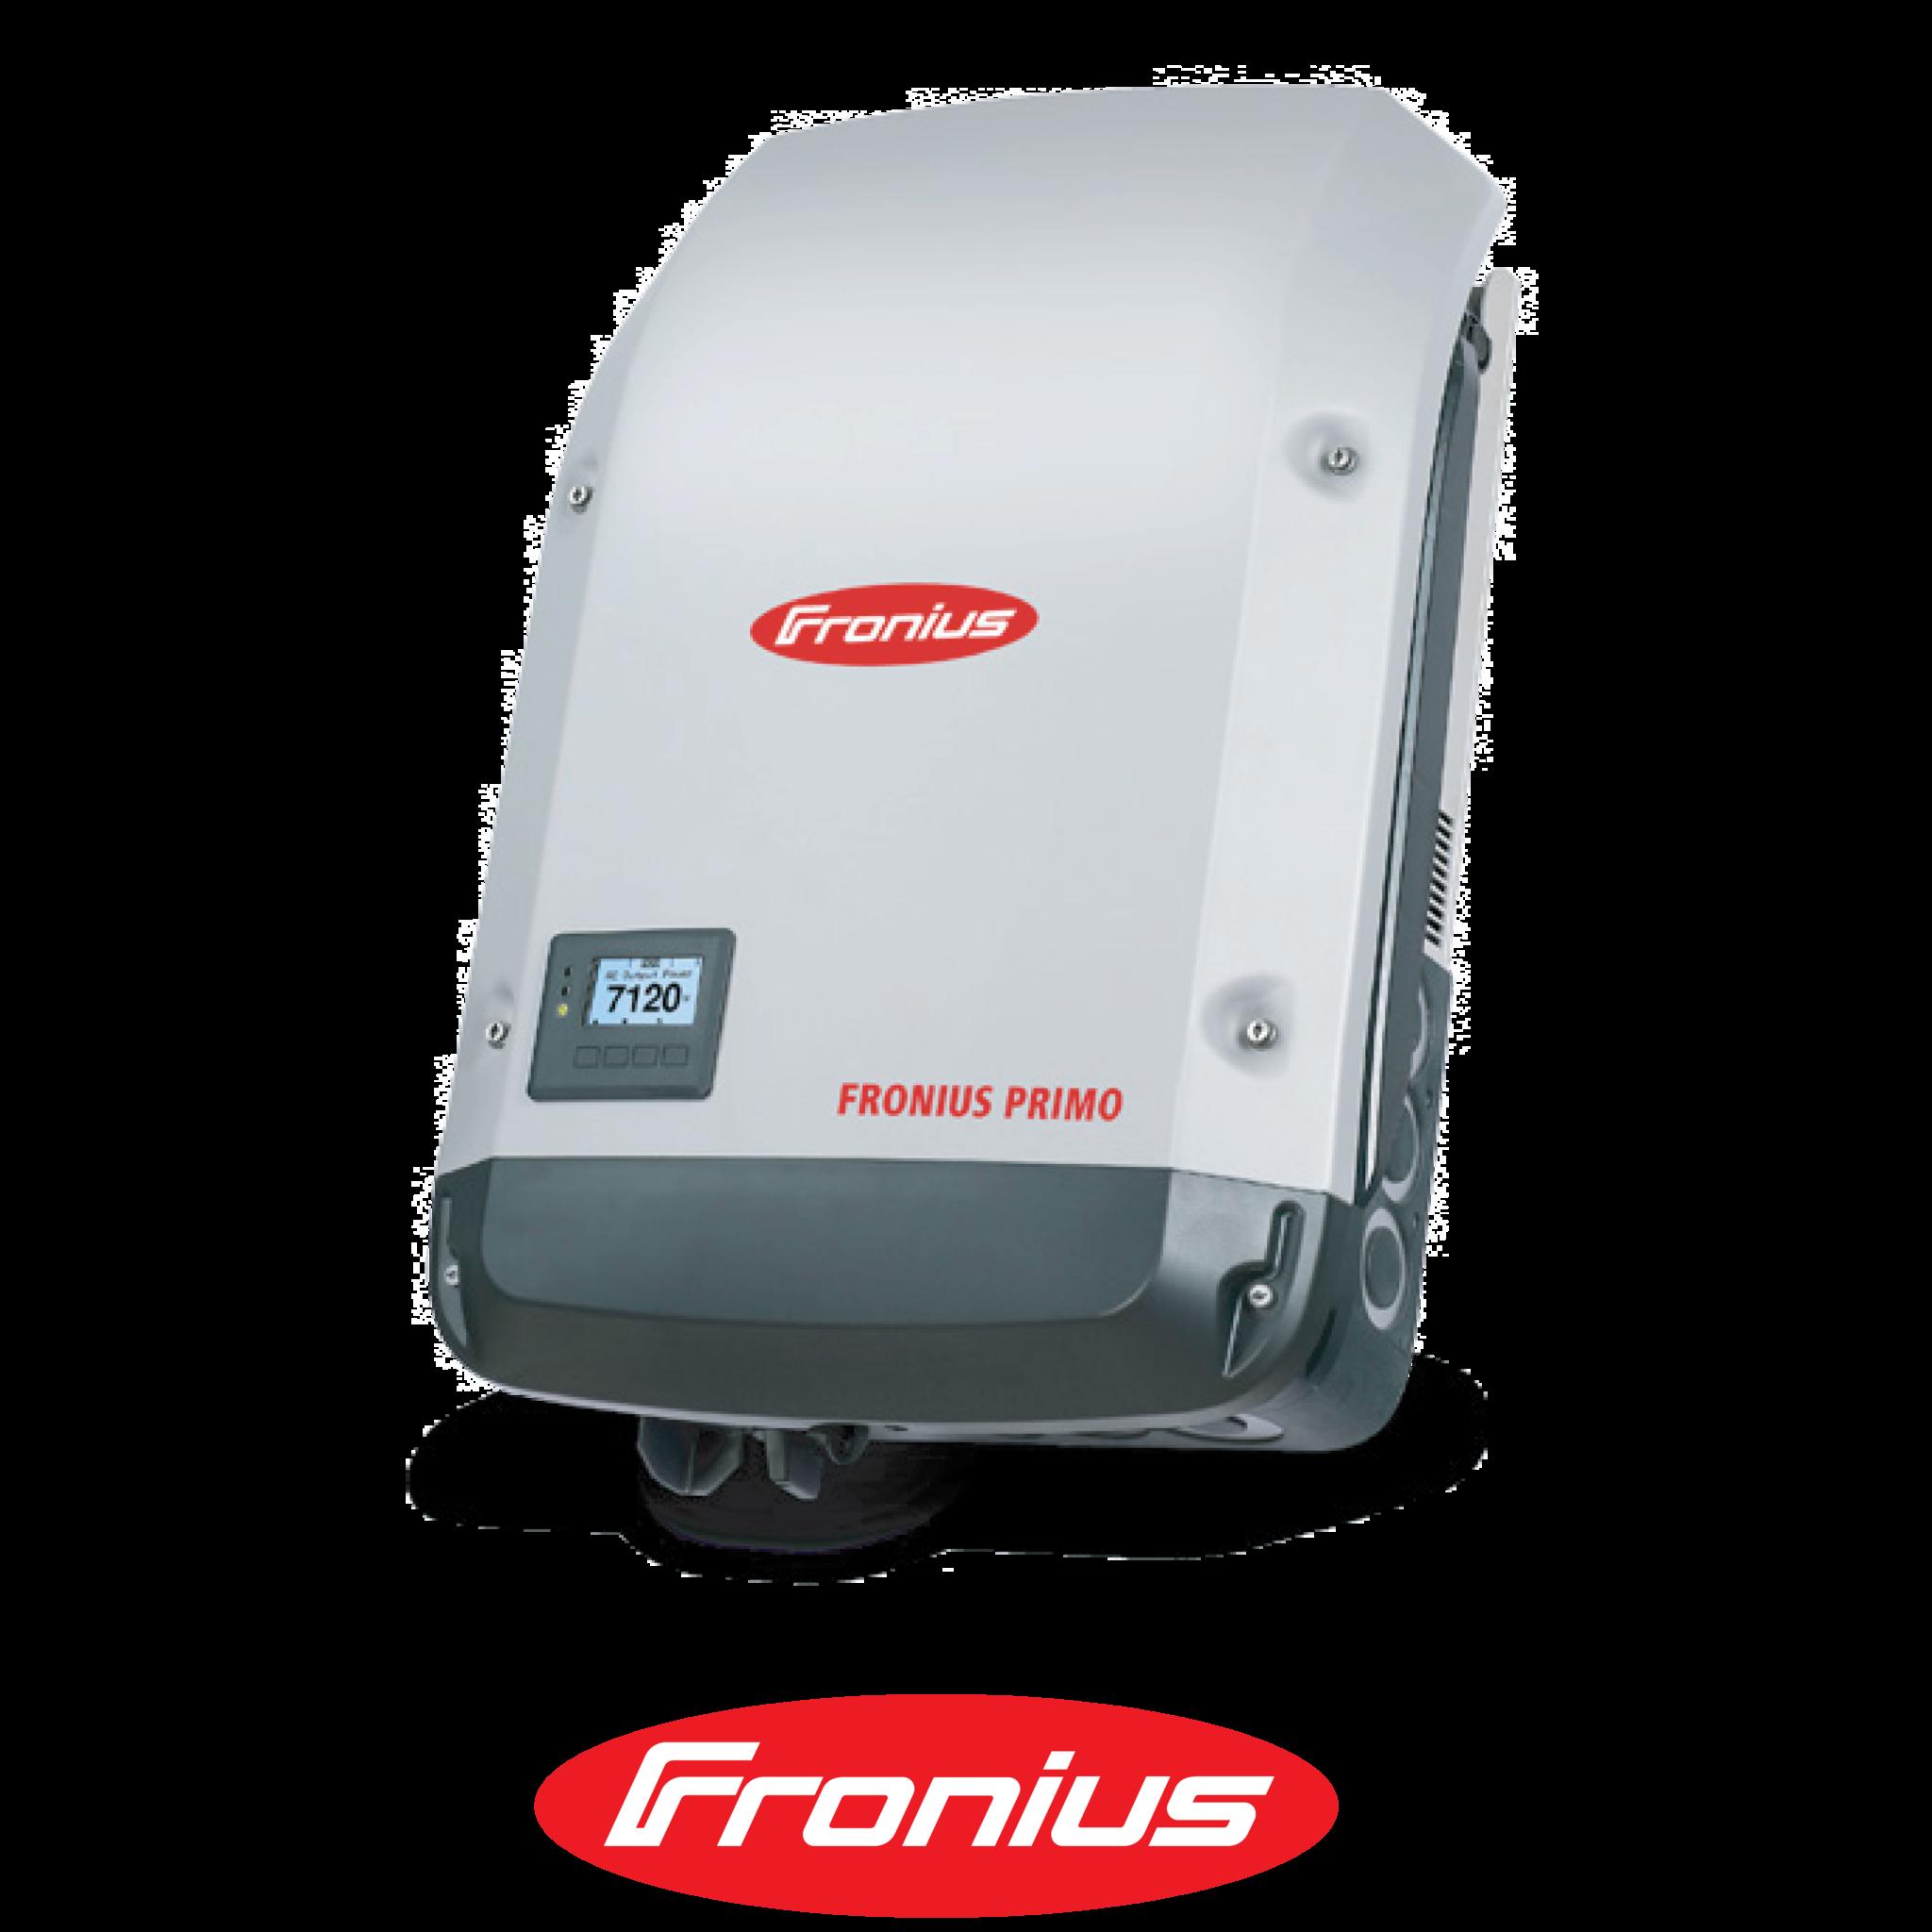 Fronius Primo Grid Tie Inverter 3 0 8 2 Kw Nocheski Solar